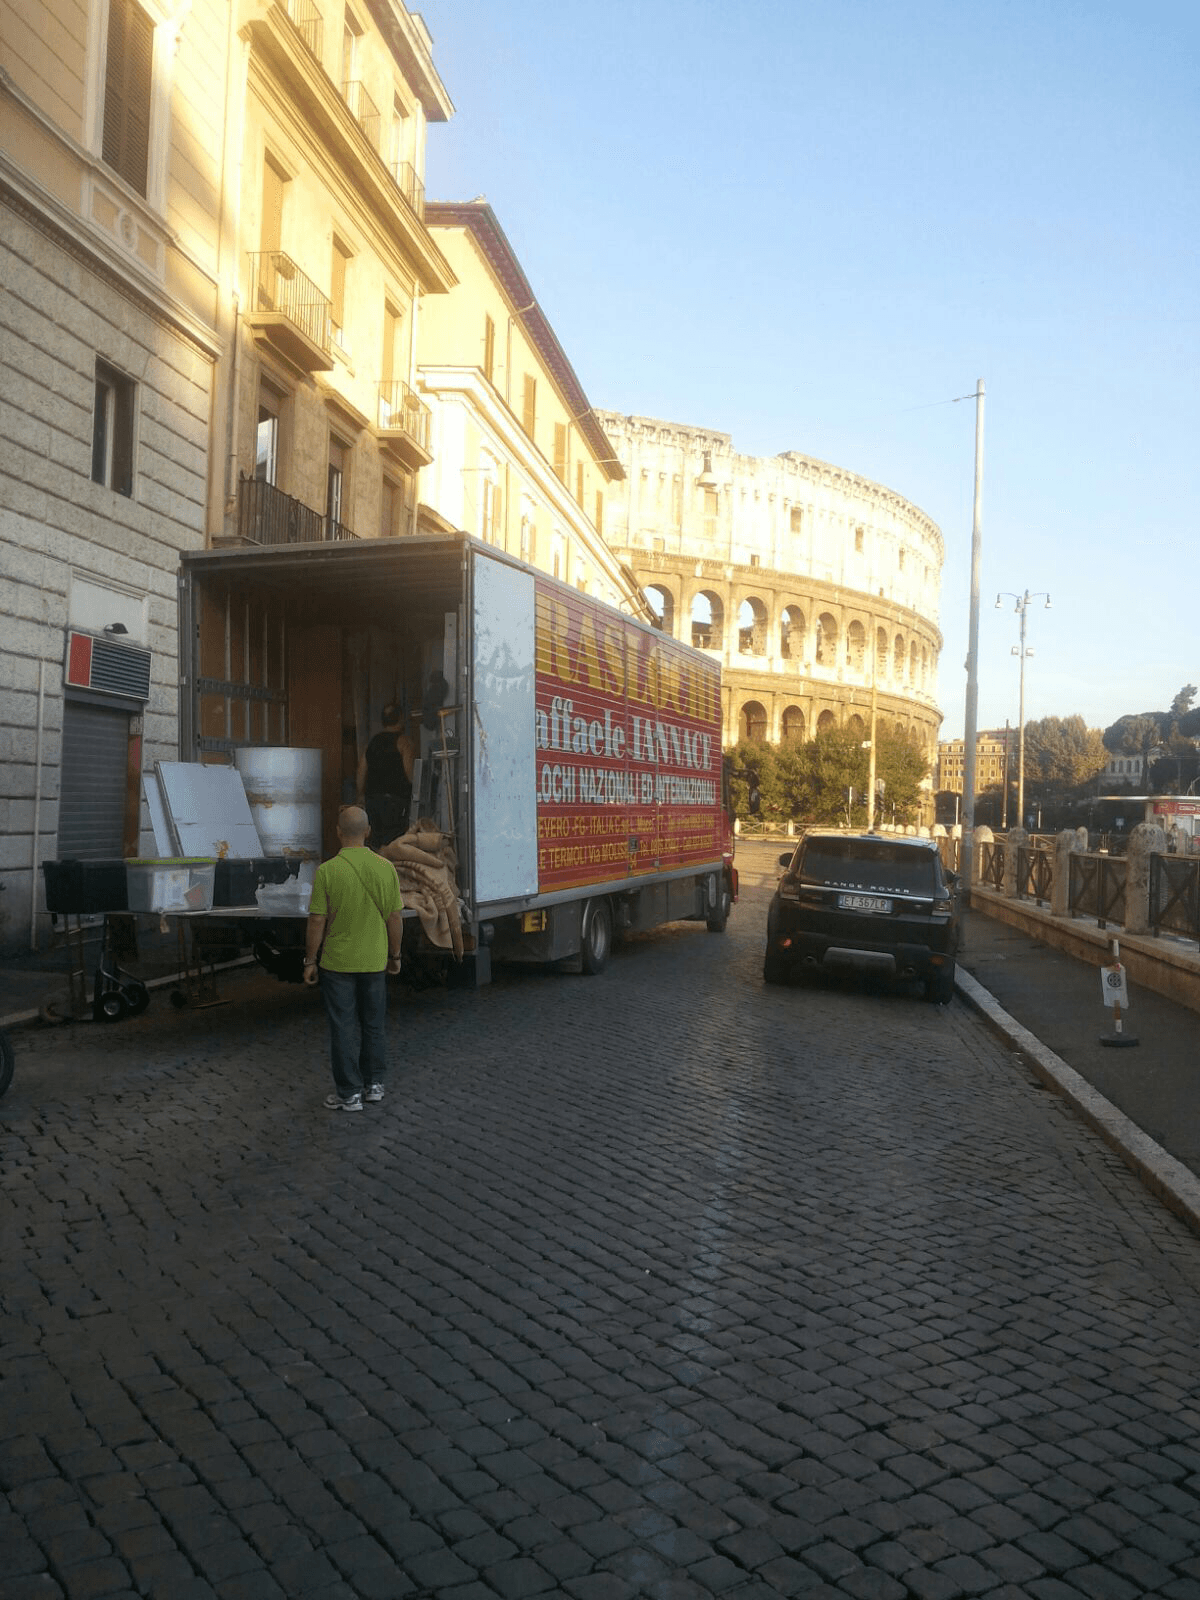 camion traslochi a roma